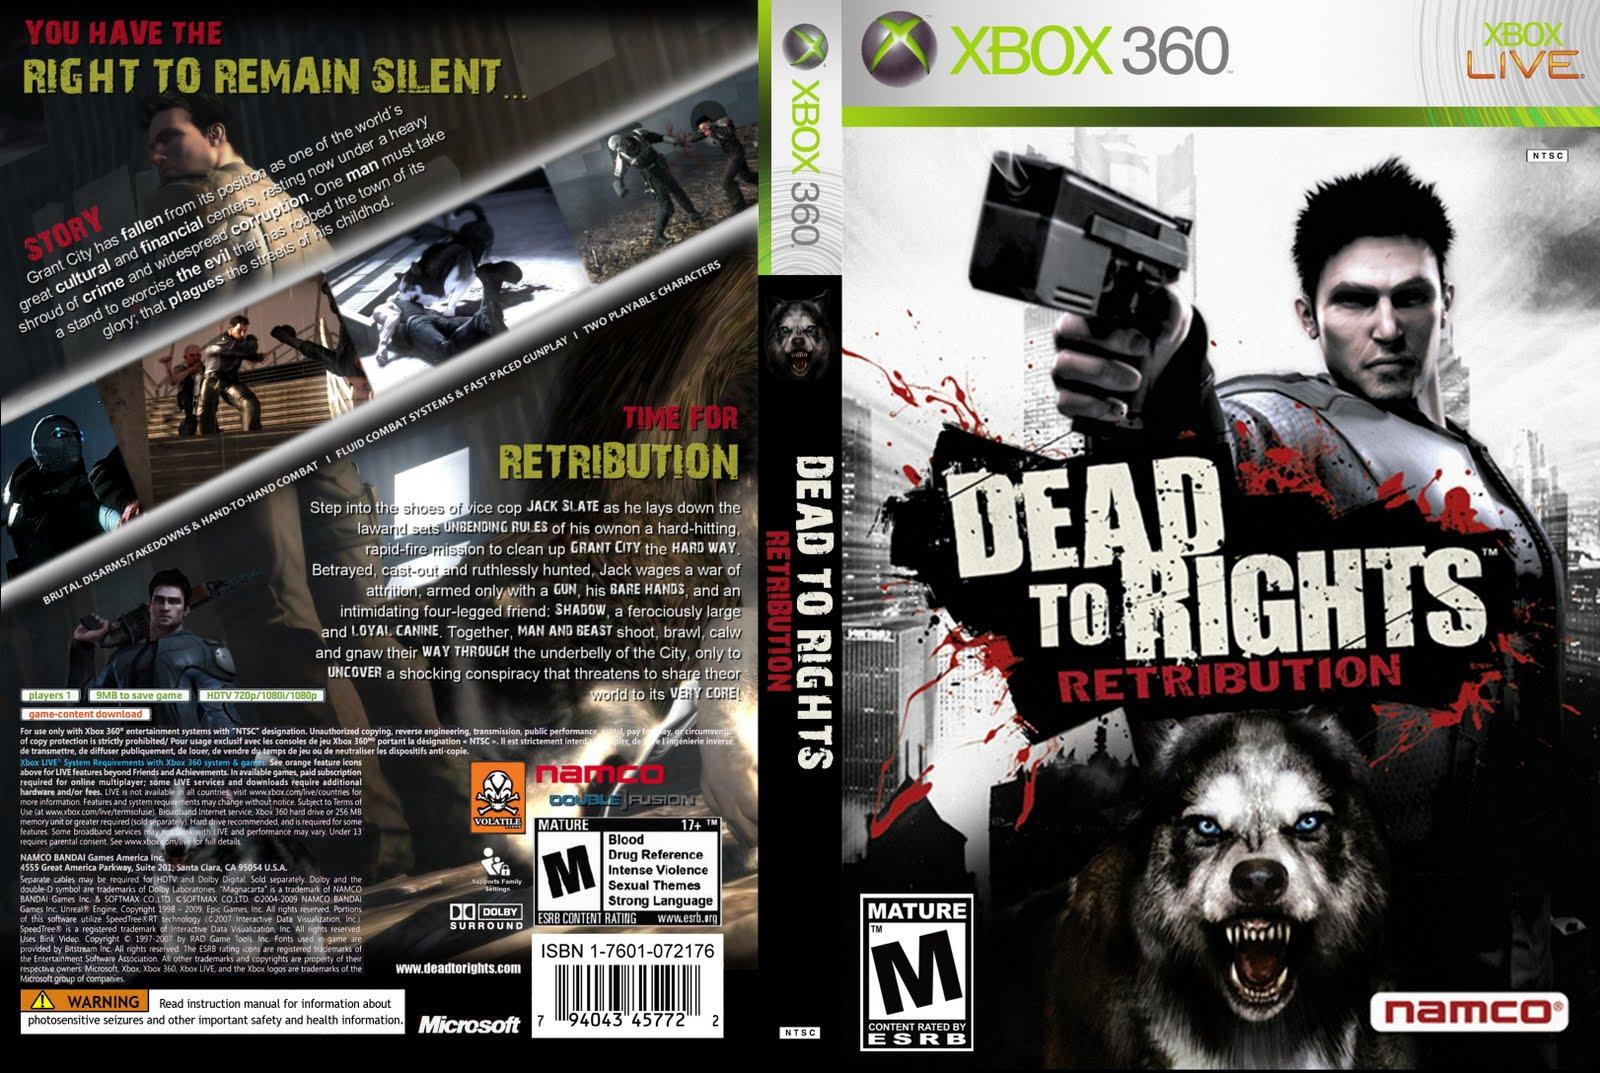 http://4.bp.blogspot.com/_gSXpAu-_FP4/S9POfDYKIlI/AAAAAAAAC3w/fx_lj0wxbCc/s1600/Dead_To_Rights_Retribution_NTSC_Custom-%255Bcdcovers_cc%255D-front.jpg